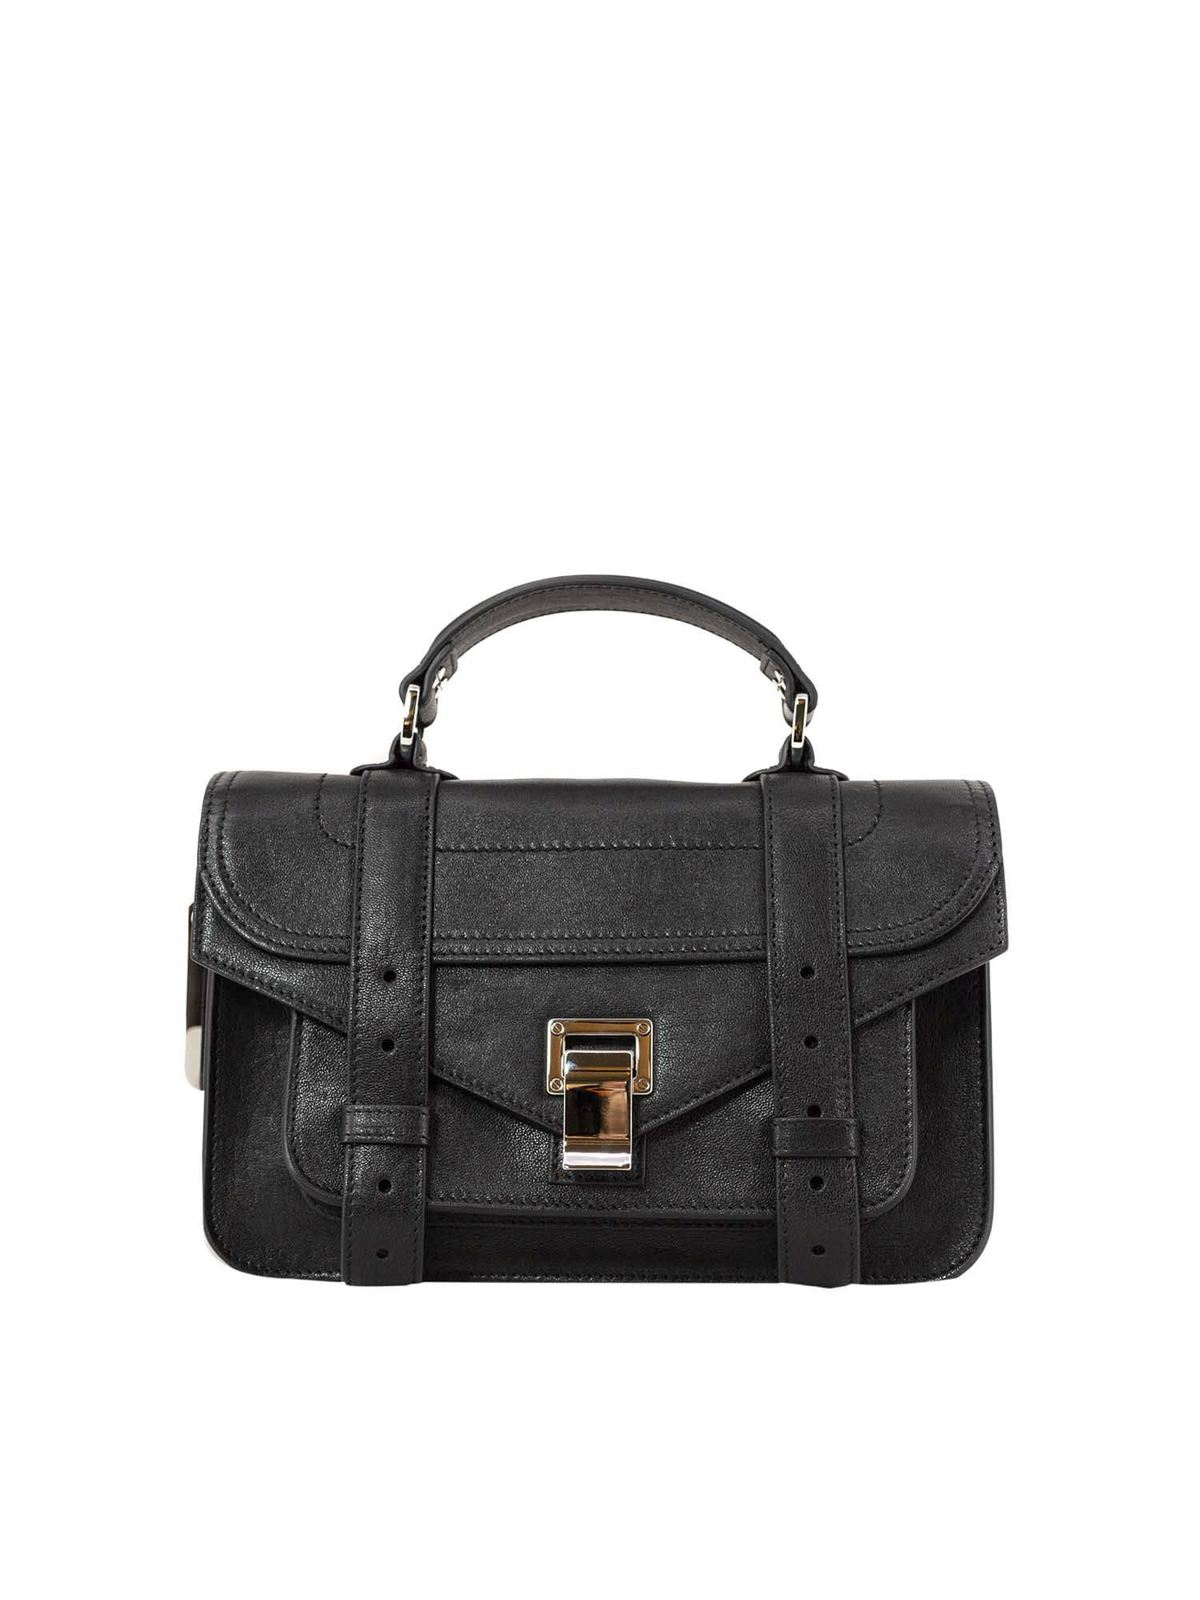 Proenza Schouler PS1 TINY BAG IN BLACK